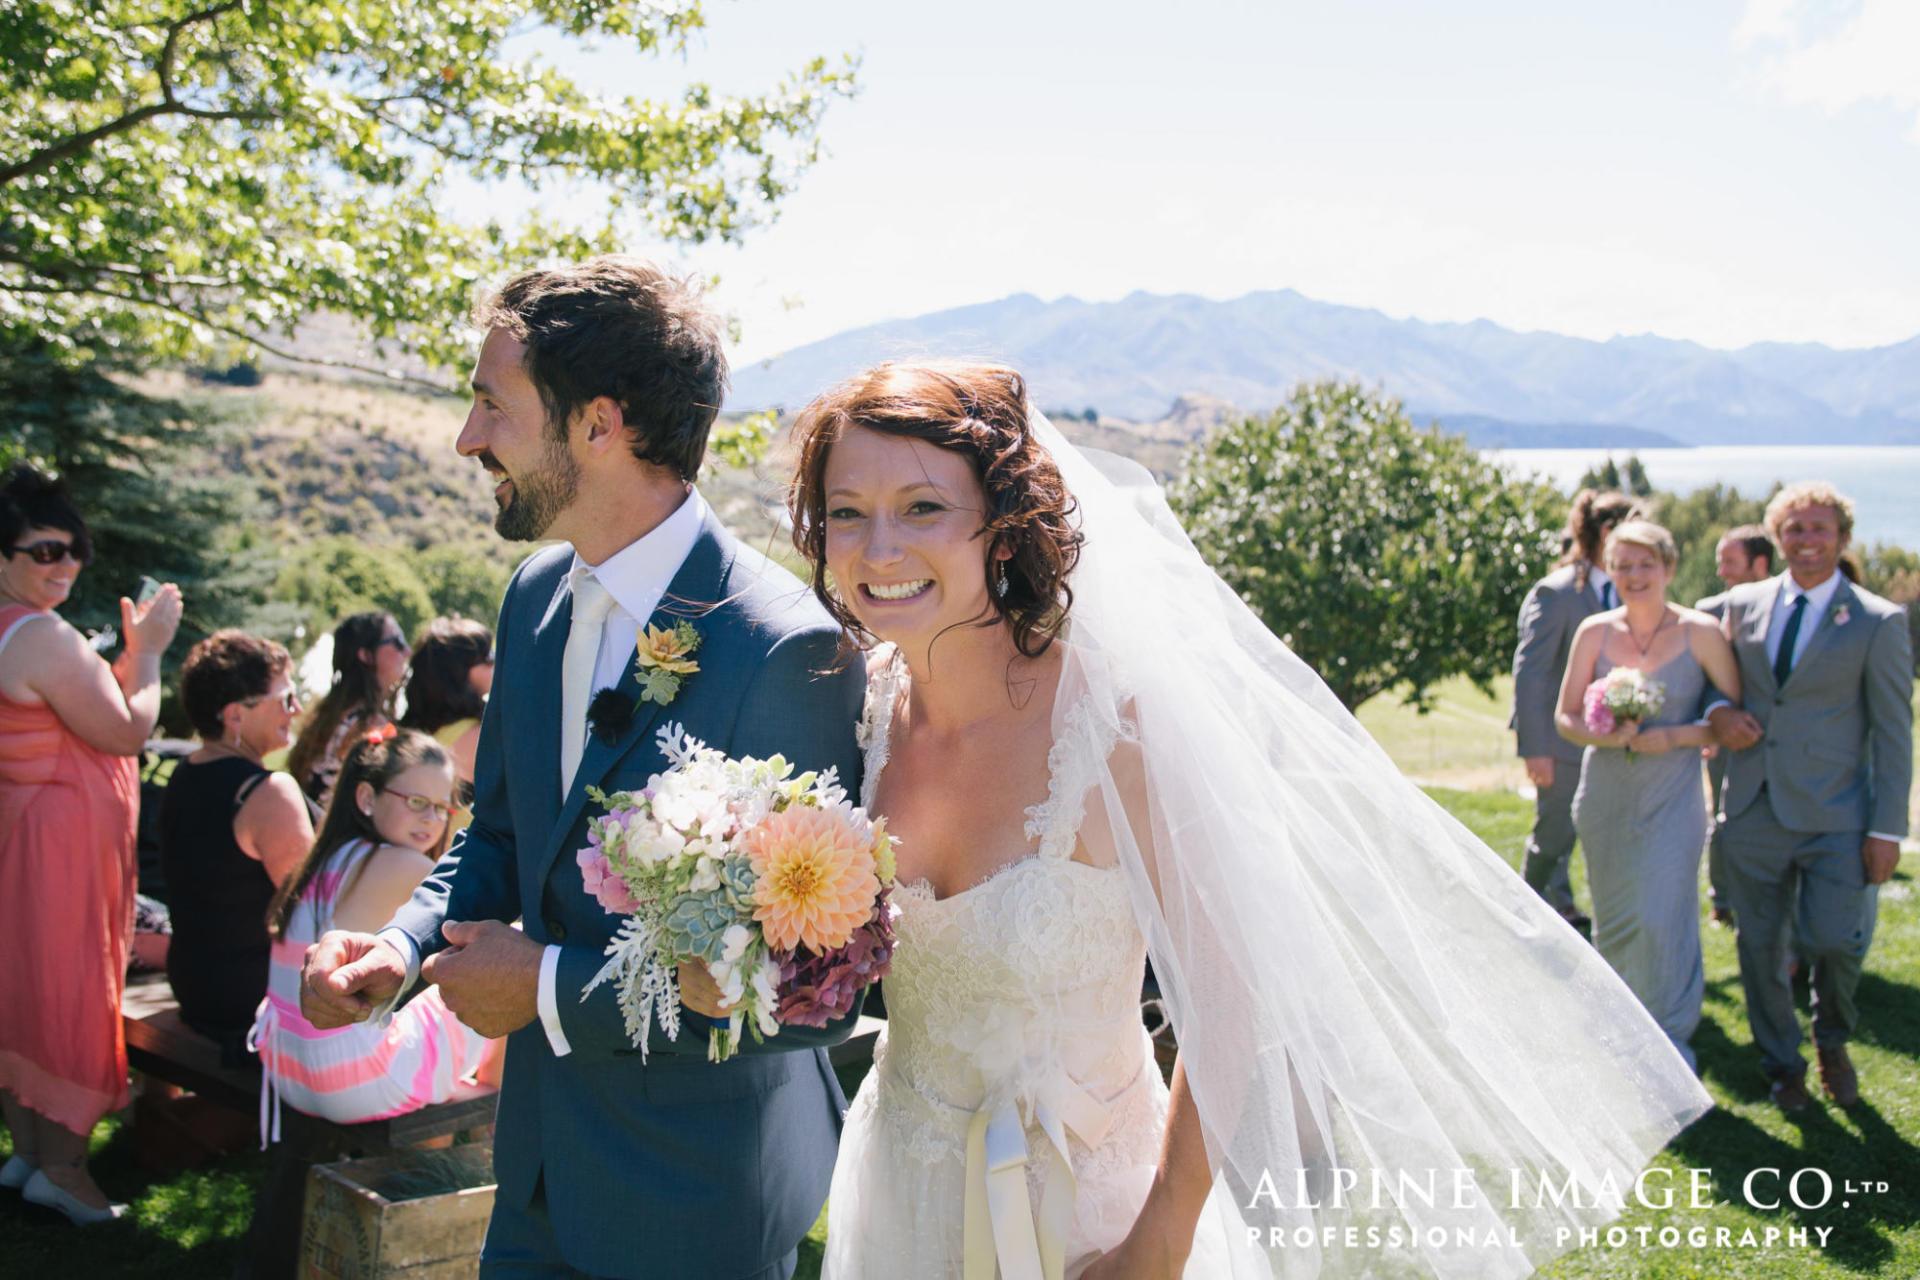 The Olive Grove Wanaka Wedding - Venue in Autumn